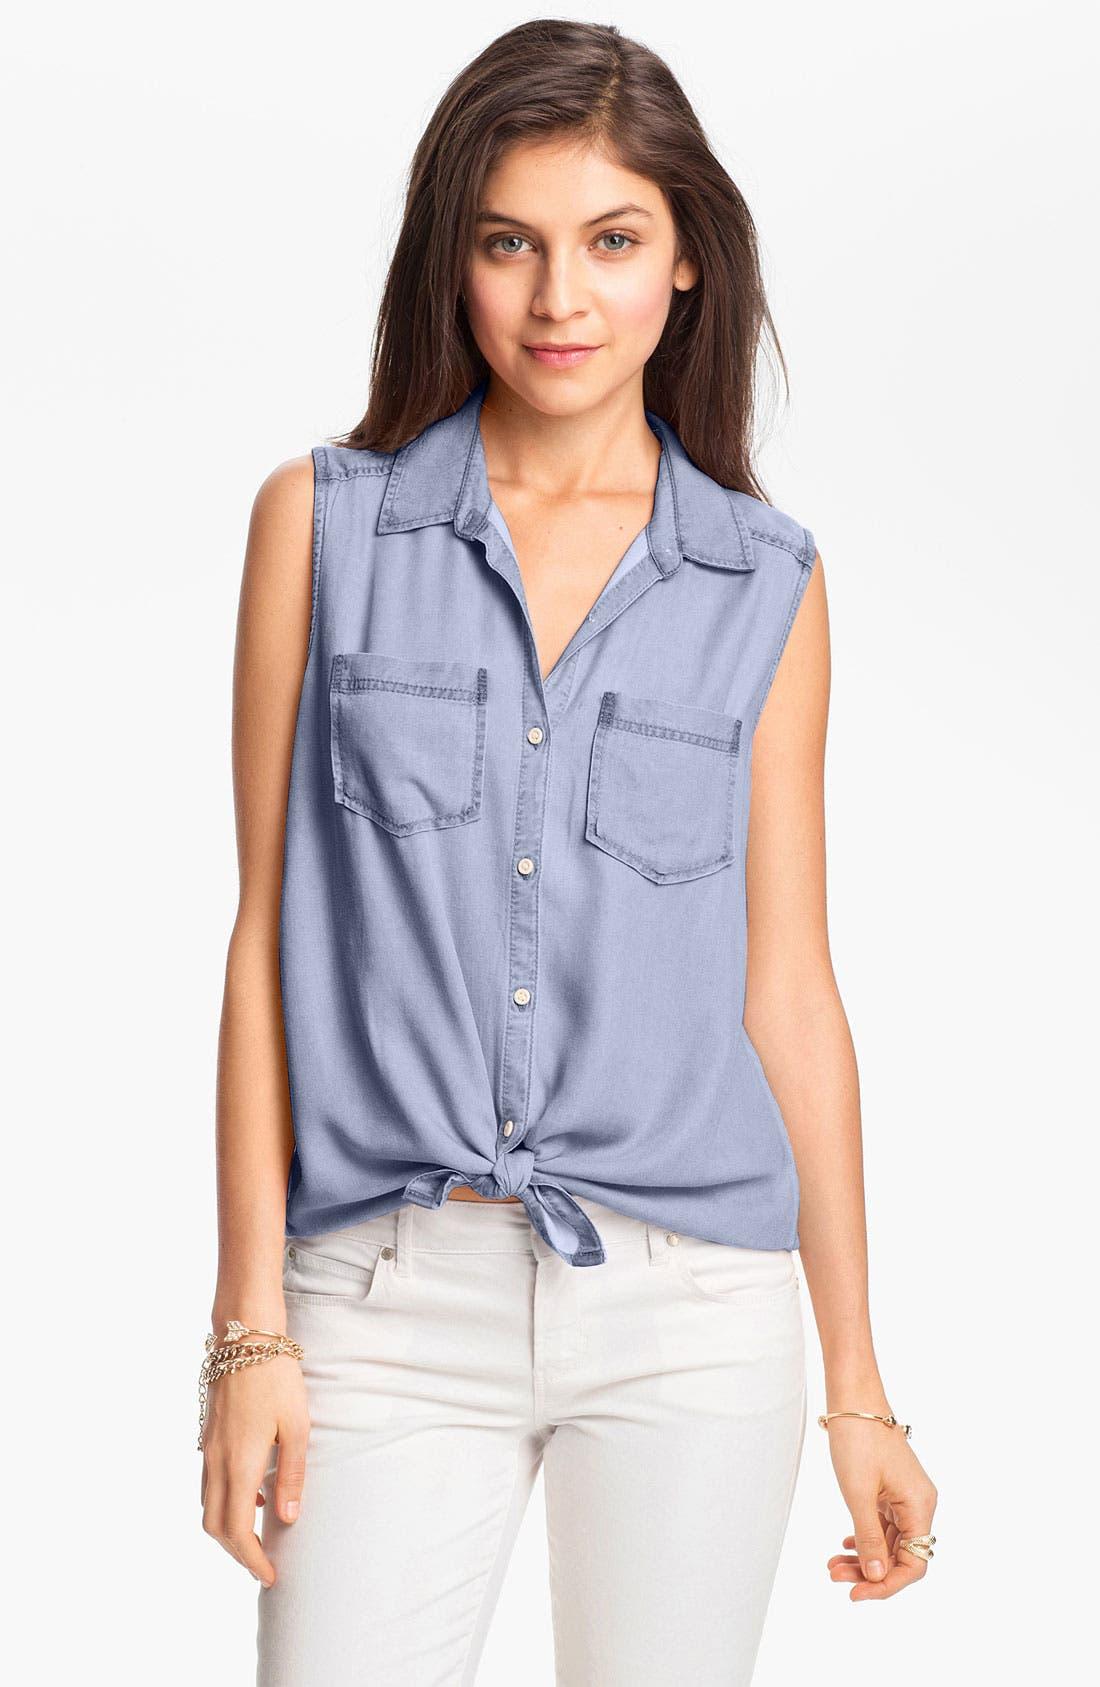 Alternate Image 1 Selected - Rubbish® Sleeveless Workwear Shirt (Juniors)